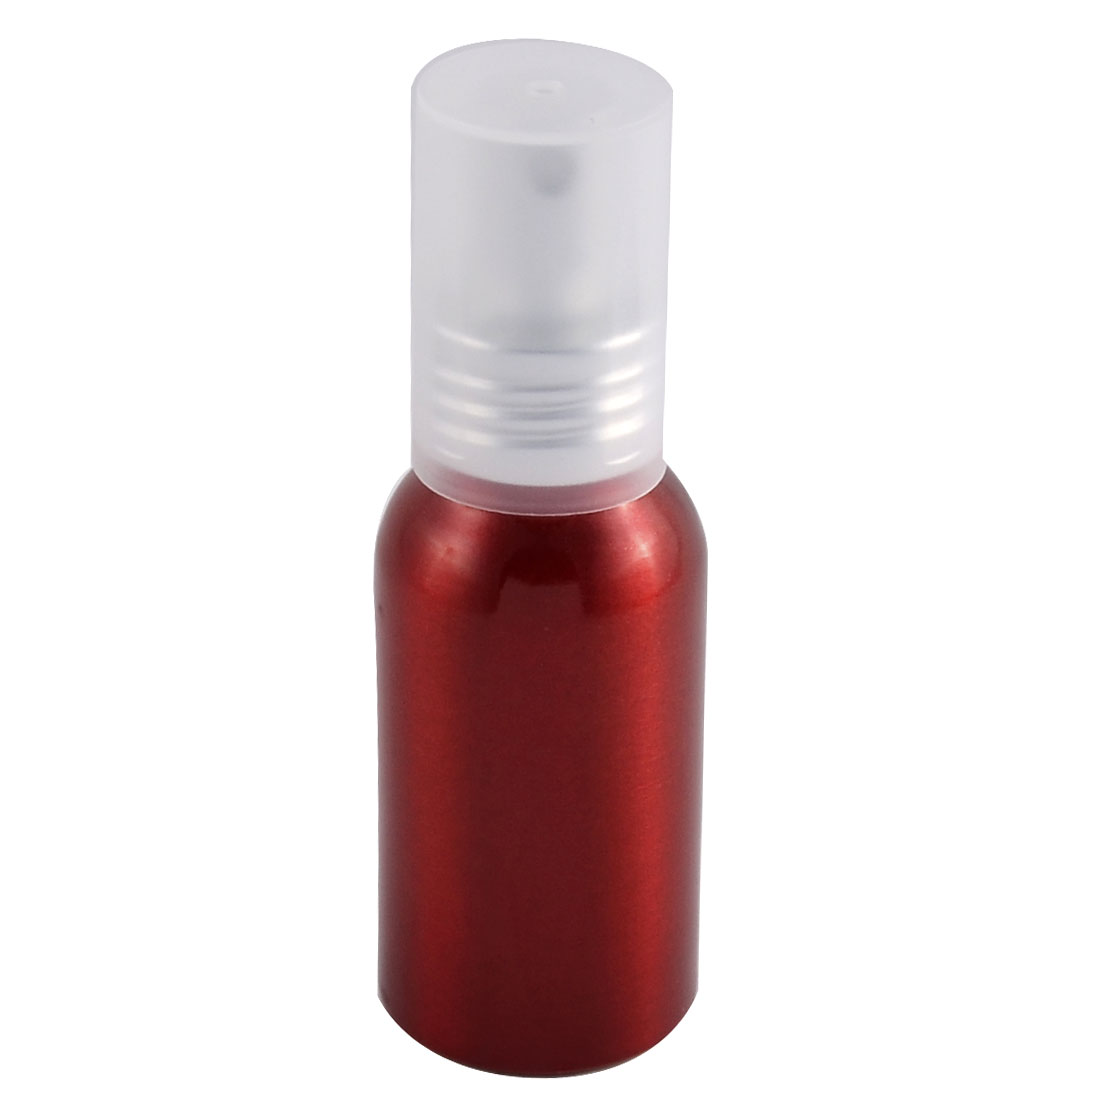 Travel Aluminum Cosmetic Emulsion Press Pump Fine Mist Spray Bottle Red 50ml